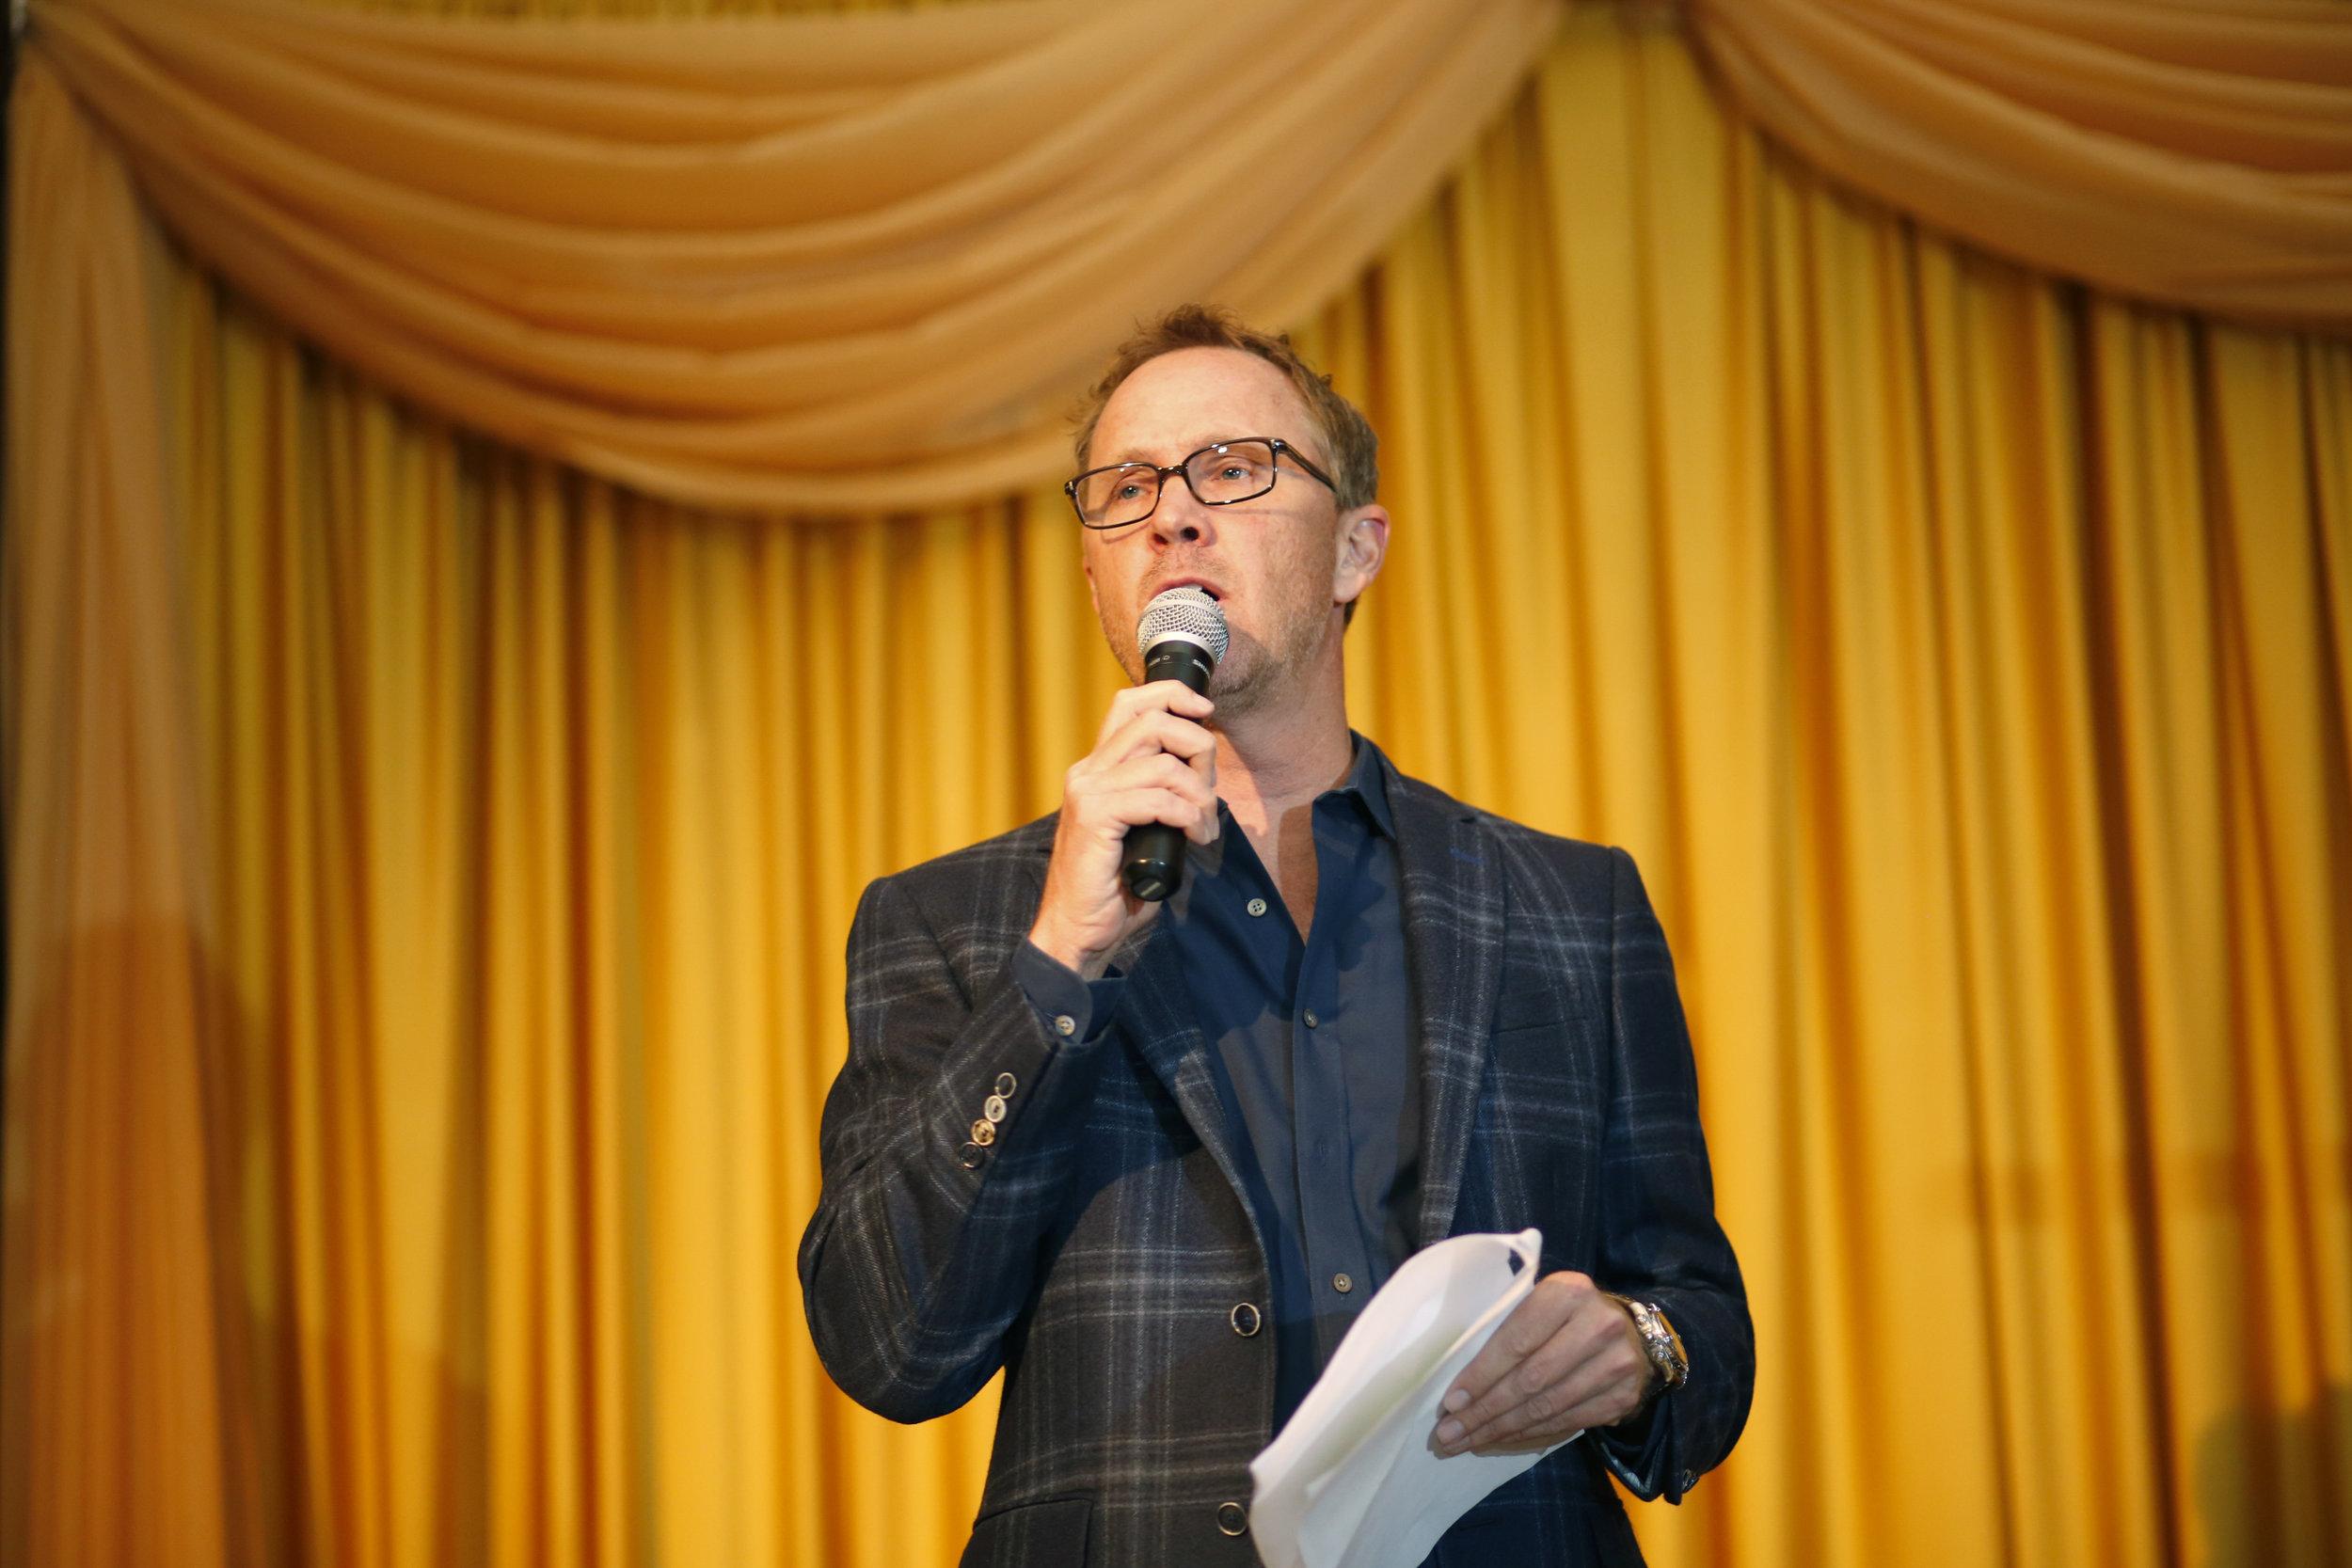 golf-give-gala-celebrity-michael-phelps-jason-day-event-photographer-madison-wi-6.jpg